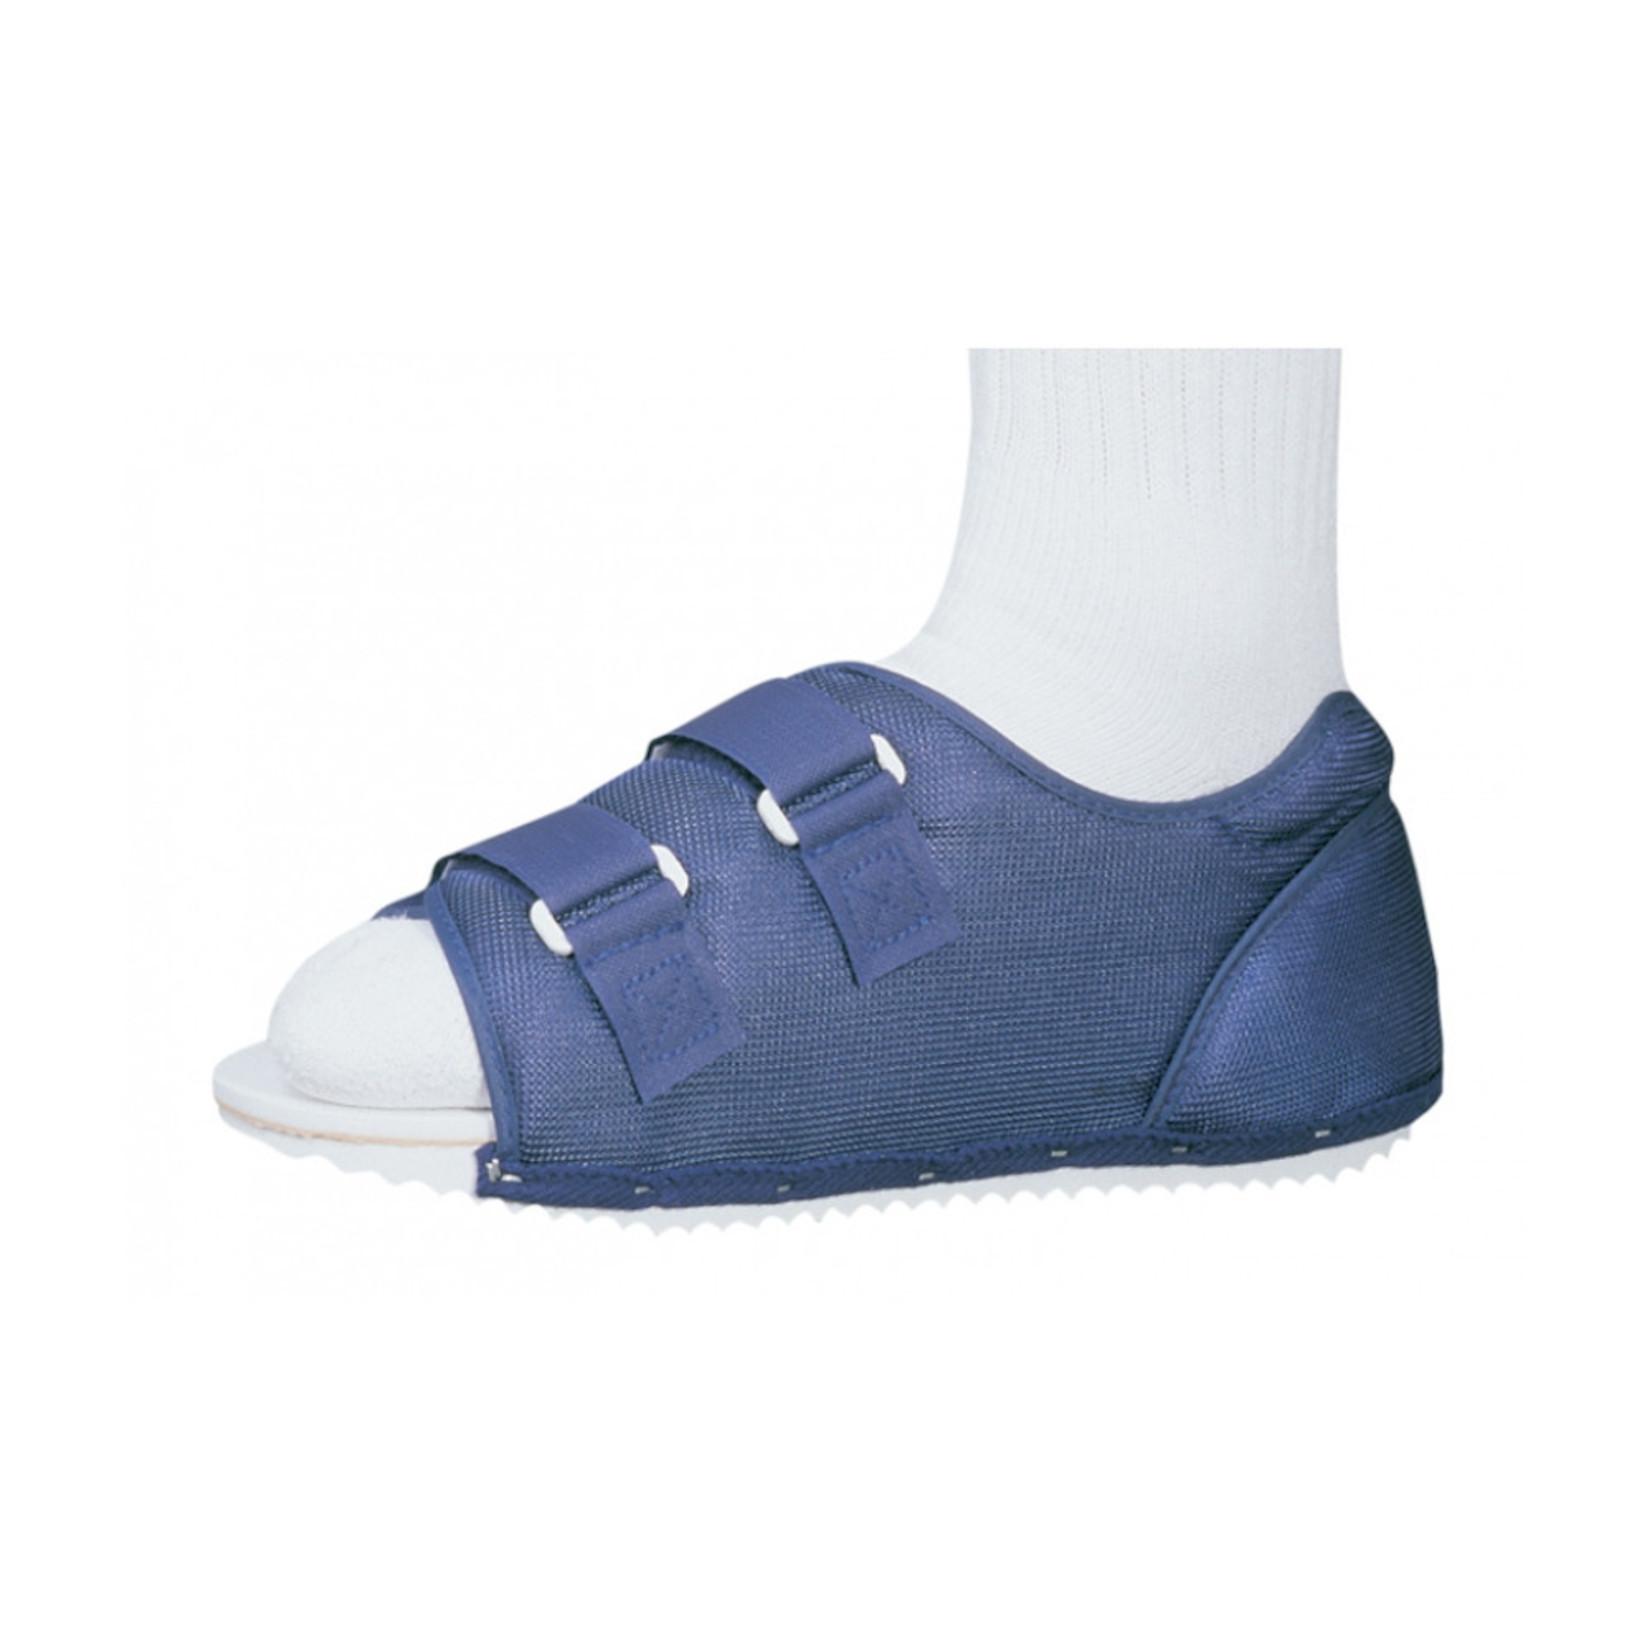 DON JOY / Aircast Post Op Shoe MEN - Small